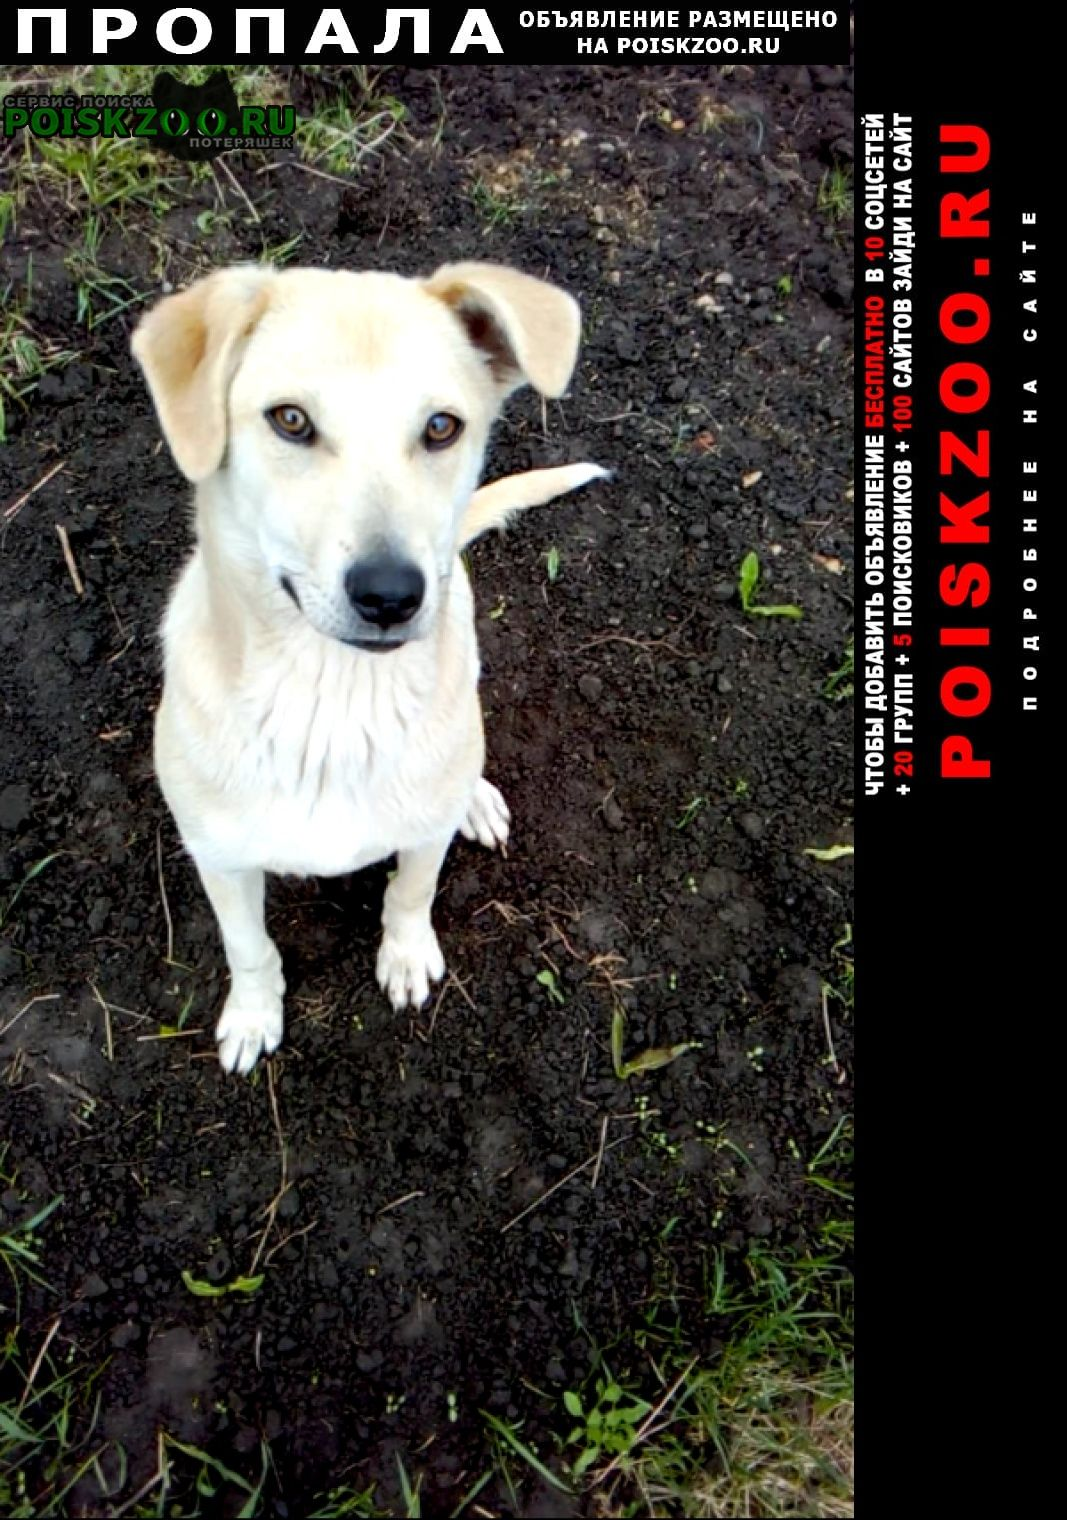 Пропала собака в районе филипповки Кропоткин